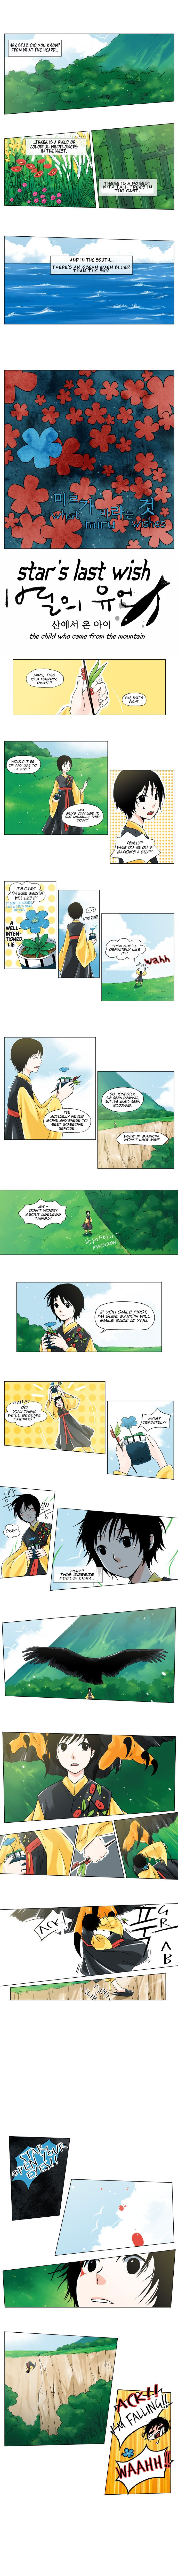 Star's Last Wish 2 Page 2